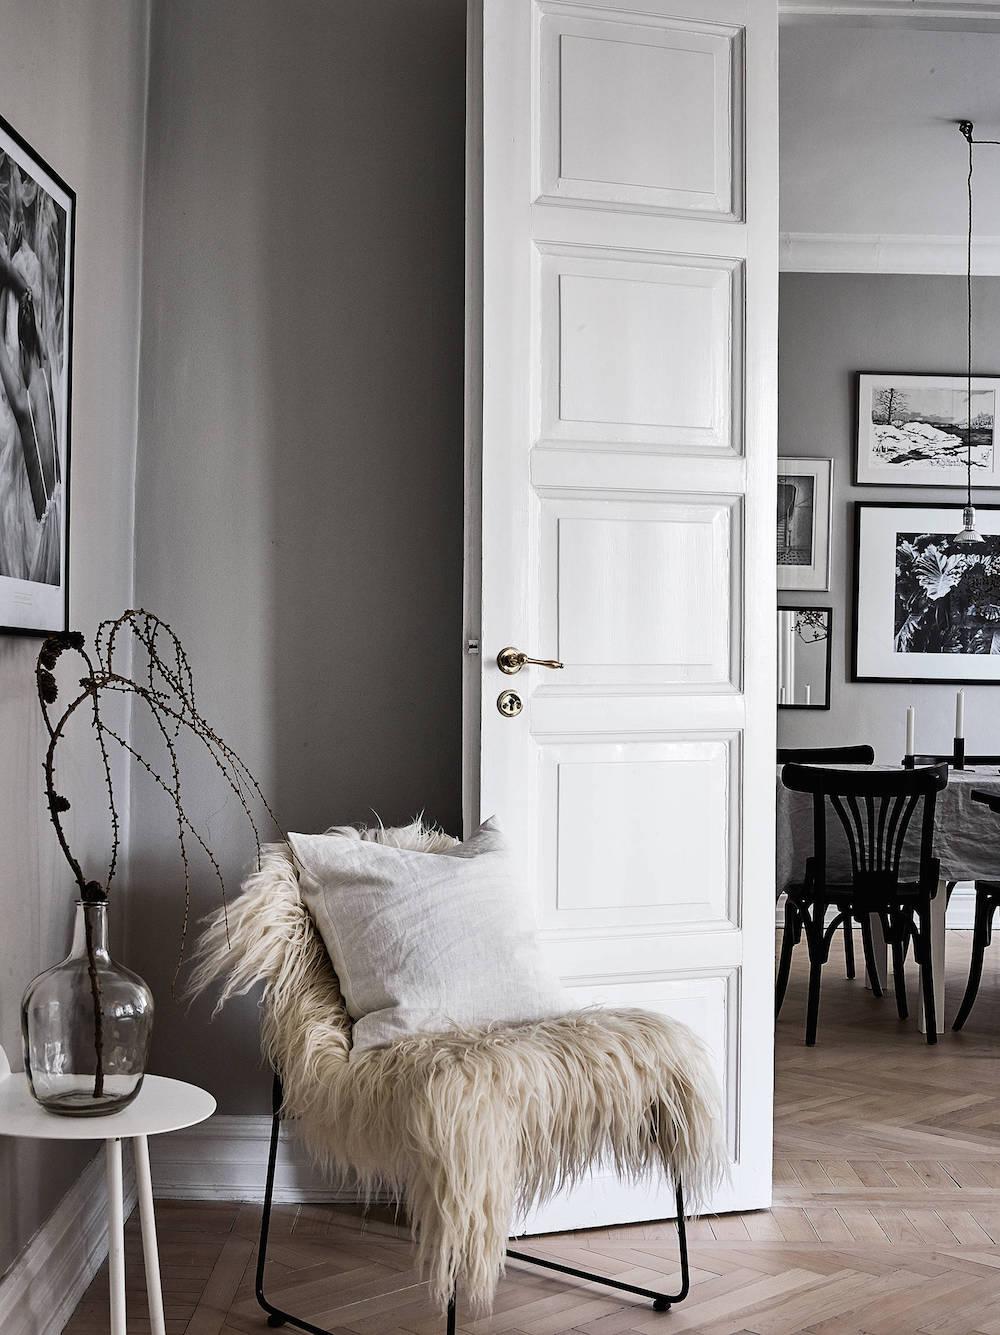 Scandinavian Black chair with fokati throw against dark grey wall